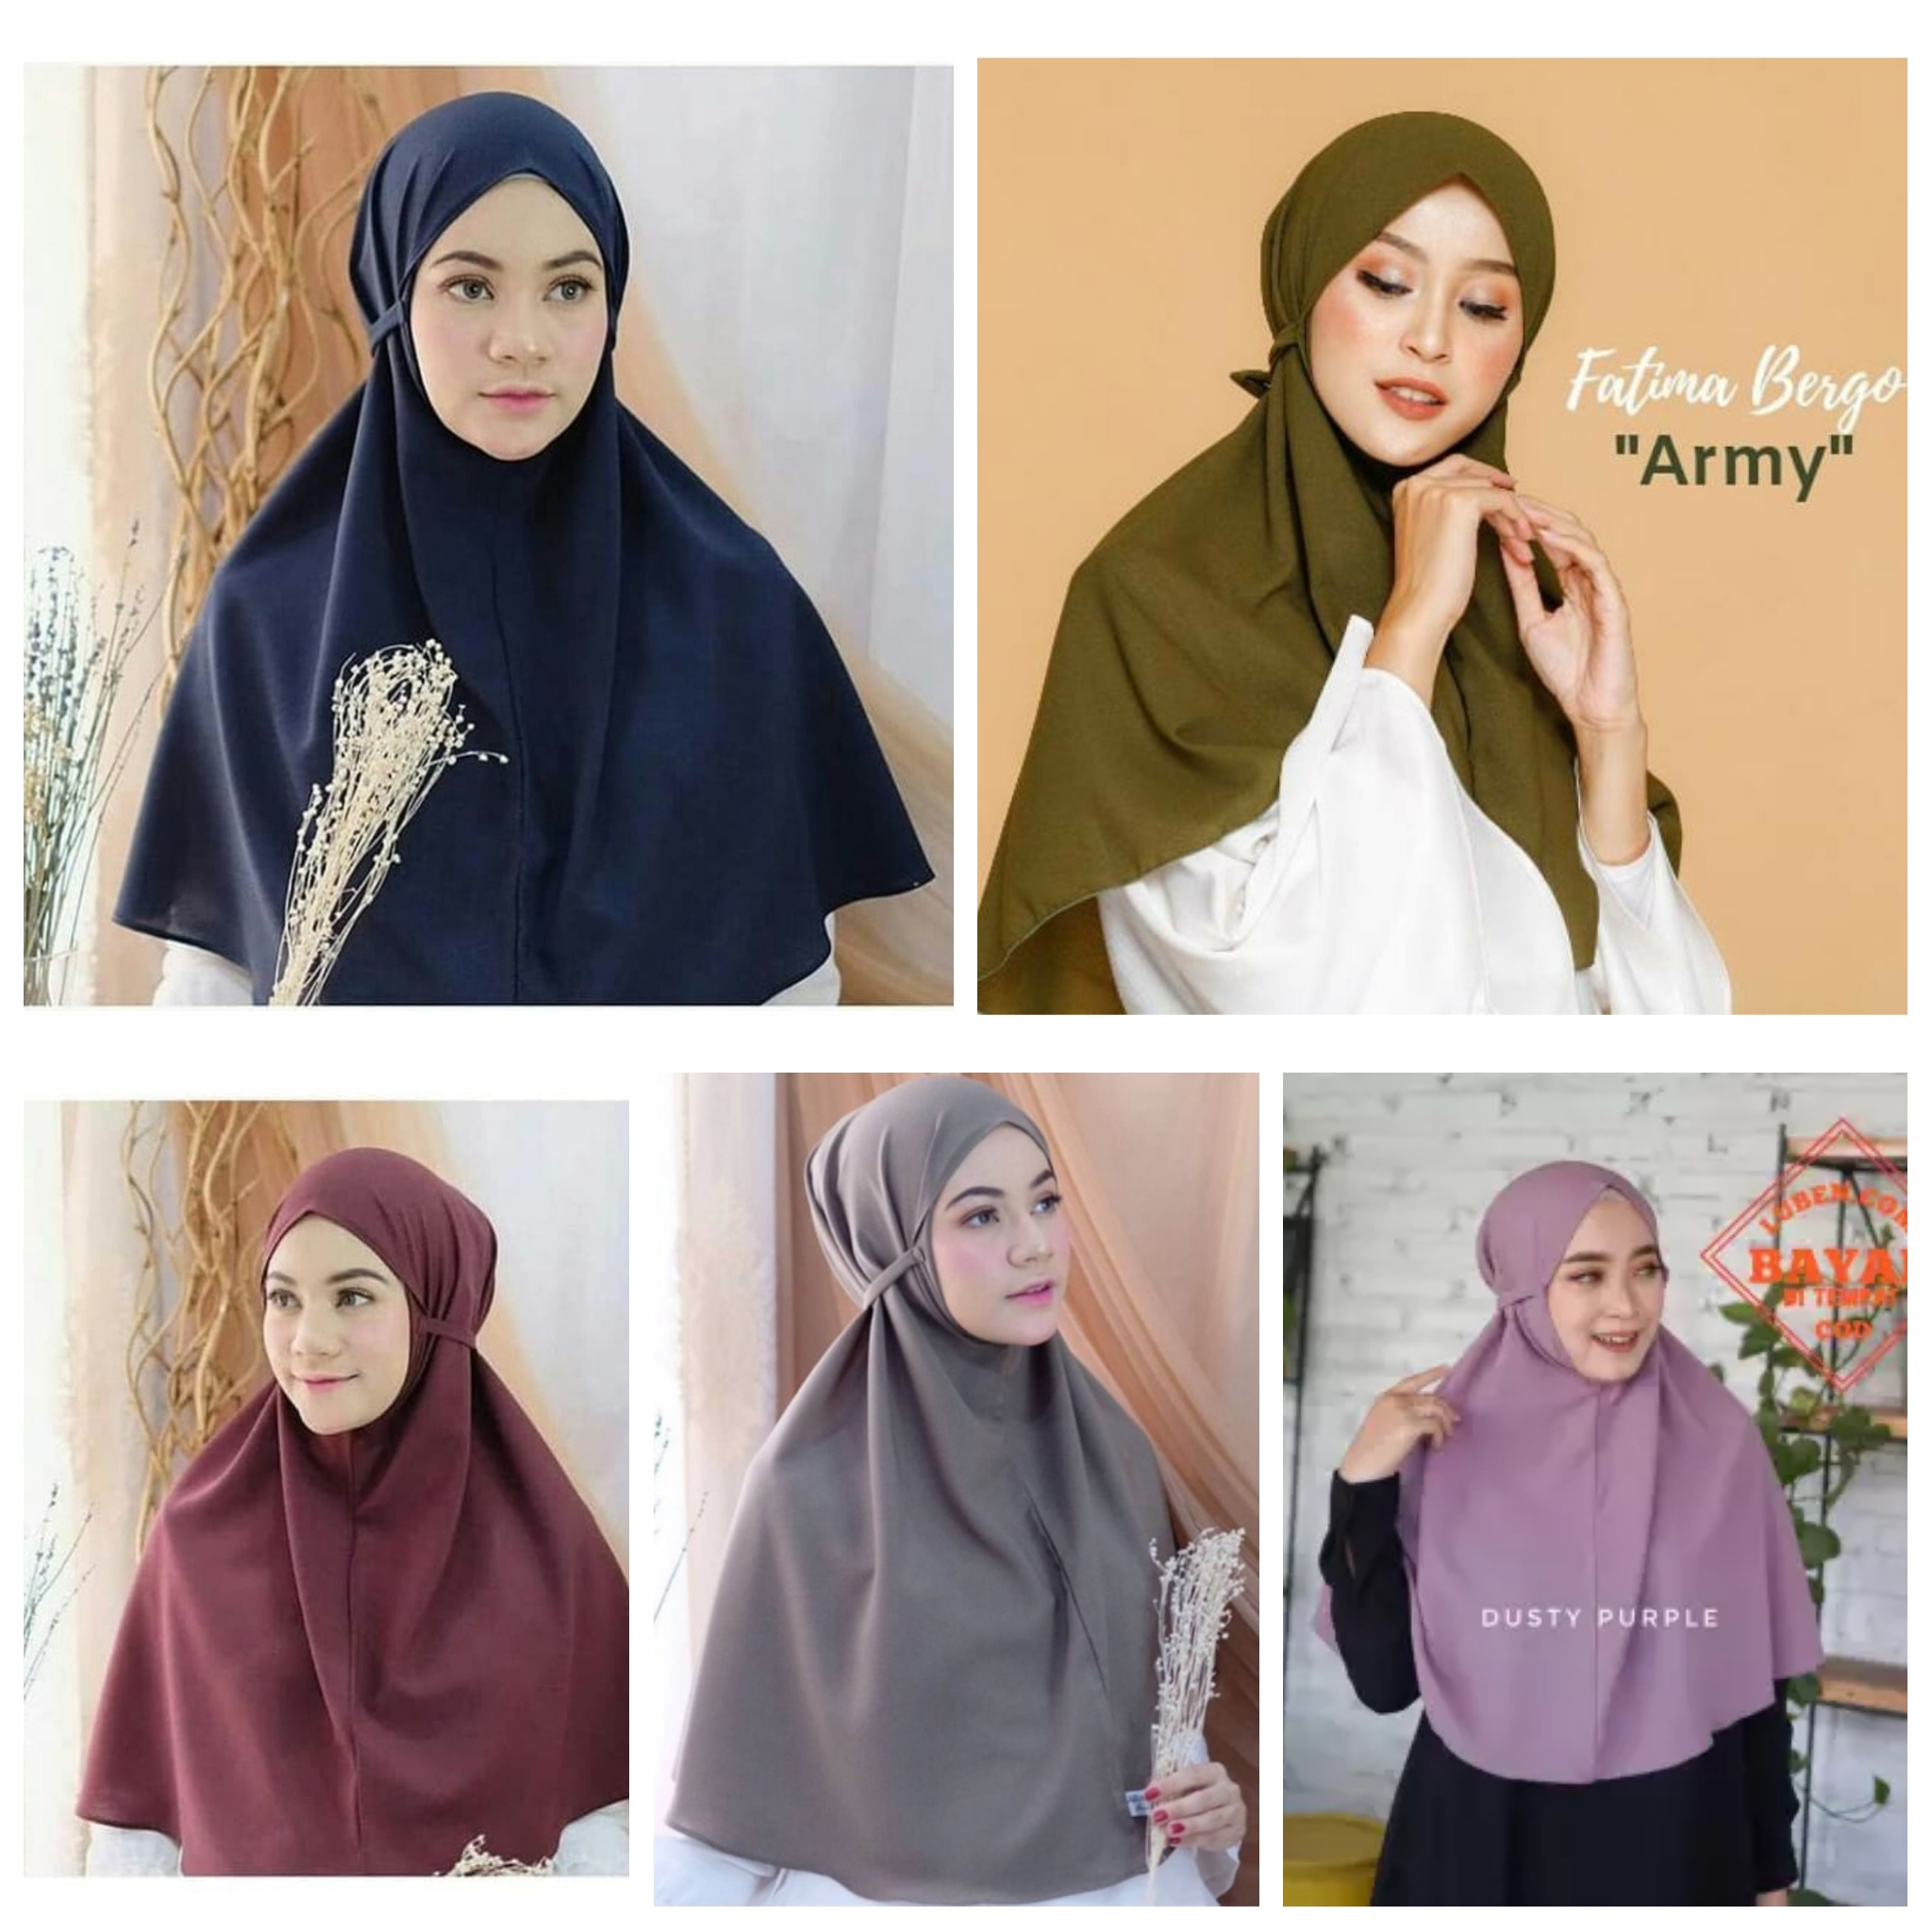 Khimar Hijab Instan Bergo Maryam Tali Non Pet Diamond Hijab Maryam Kerudung Instant Tali Khimar Maryam Tali Kerudung Terbaru 2020 Lazada Indonesia